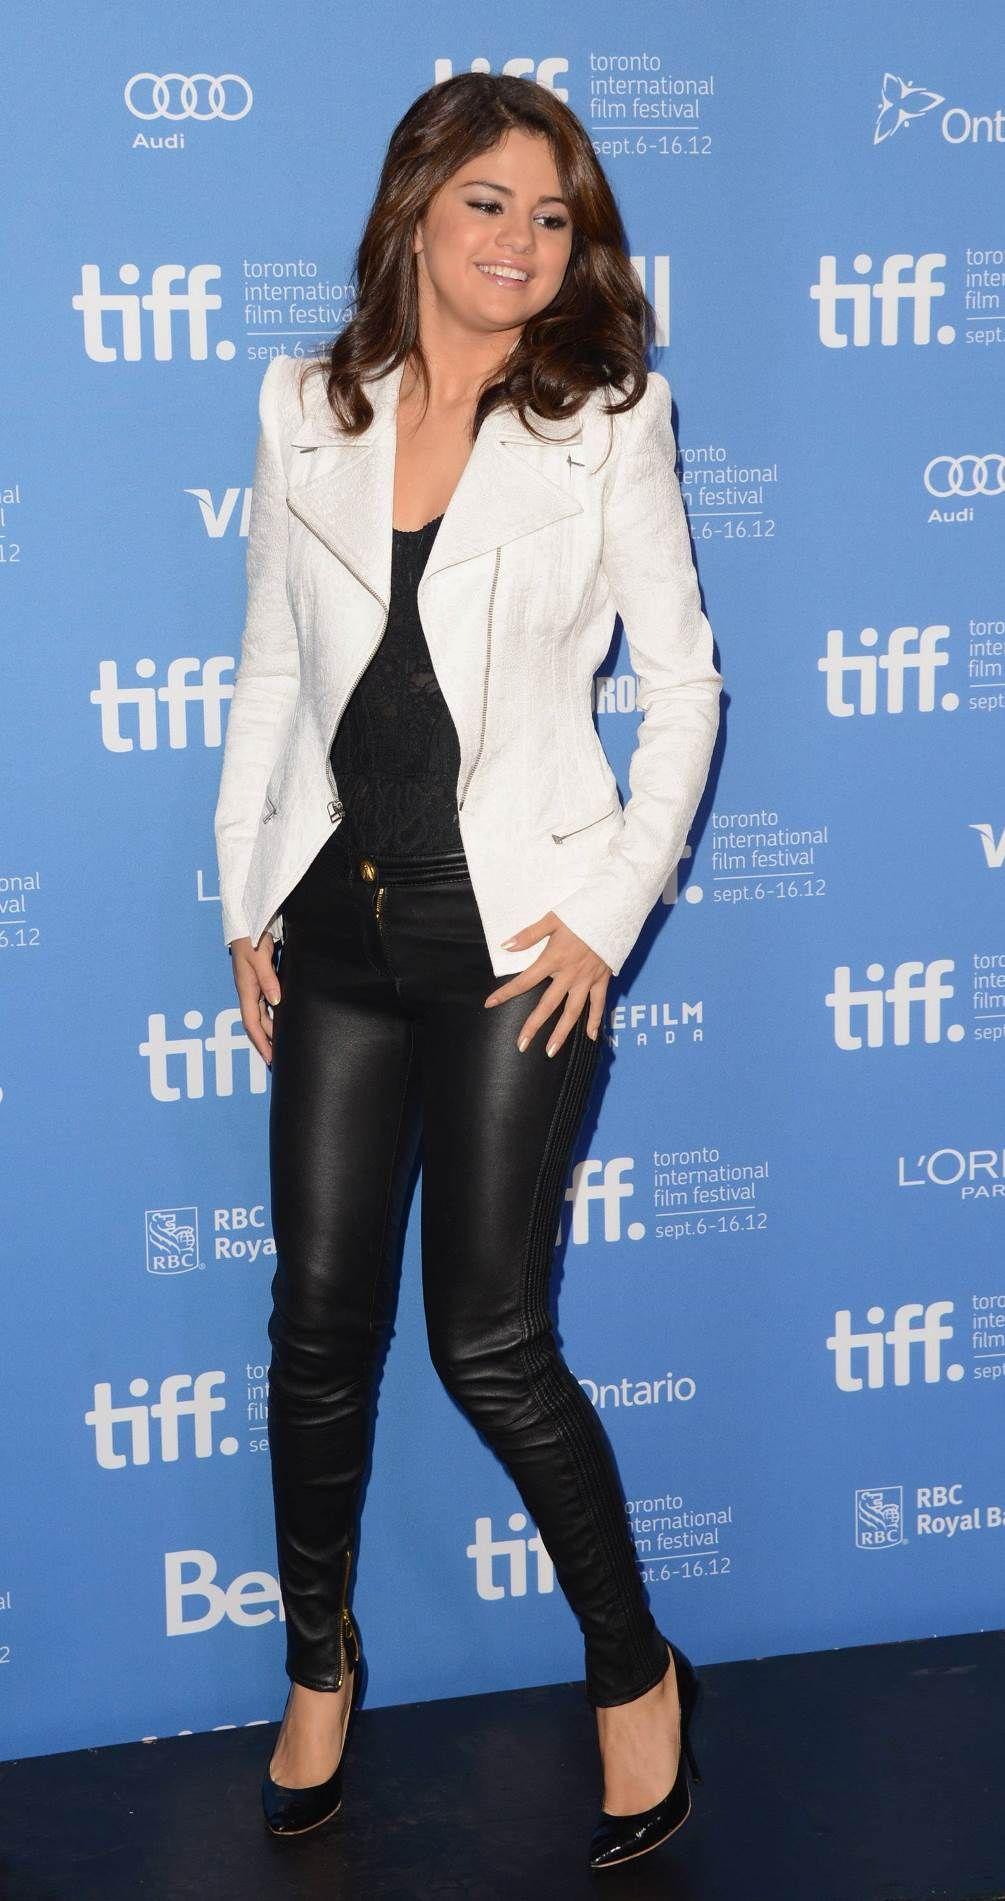 Pin by Fashion Dolling on Selena Gomez | Selena gomez hot ...